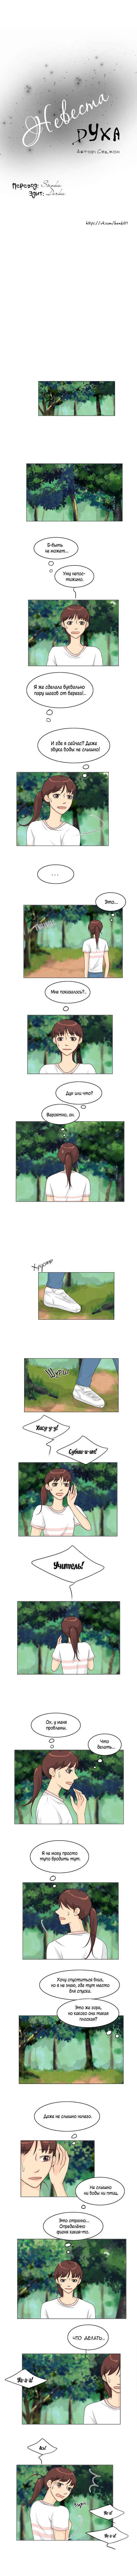 https://r1.ninemanga.com/comics/pic2/8/31048/426367/1535044484908.jpg Page 1